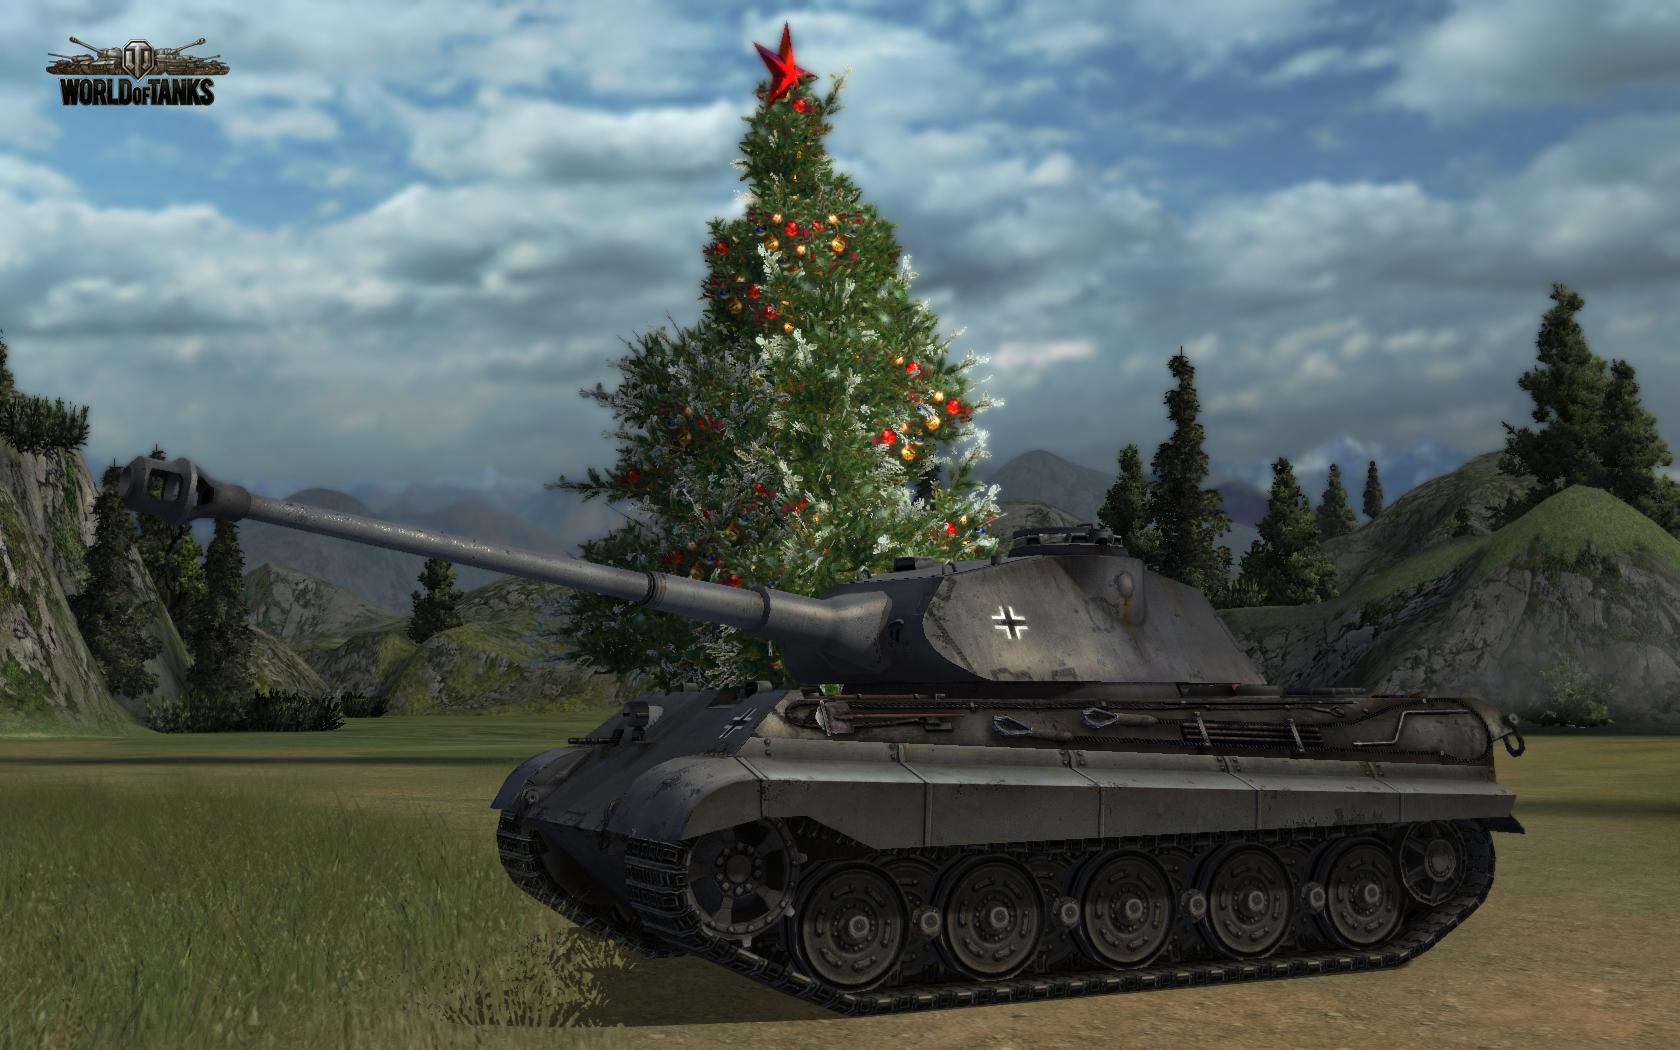 картинки ворлд оф танк новые танки замуж миллионера